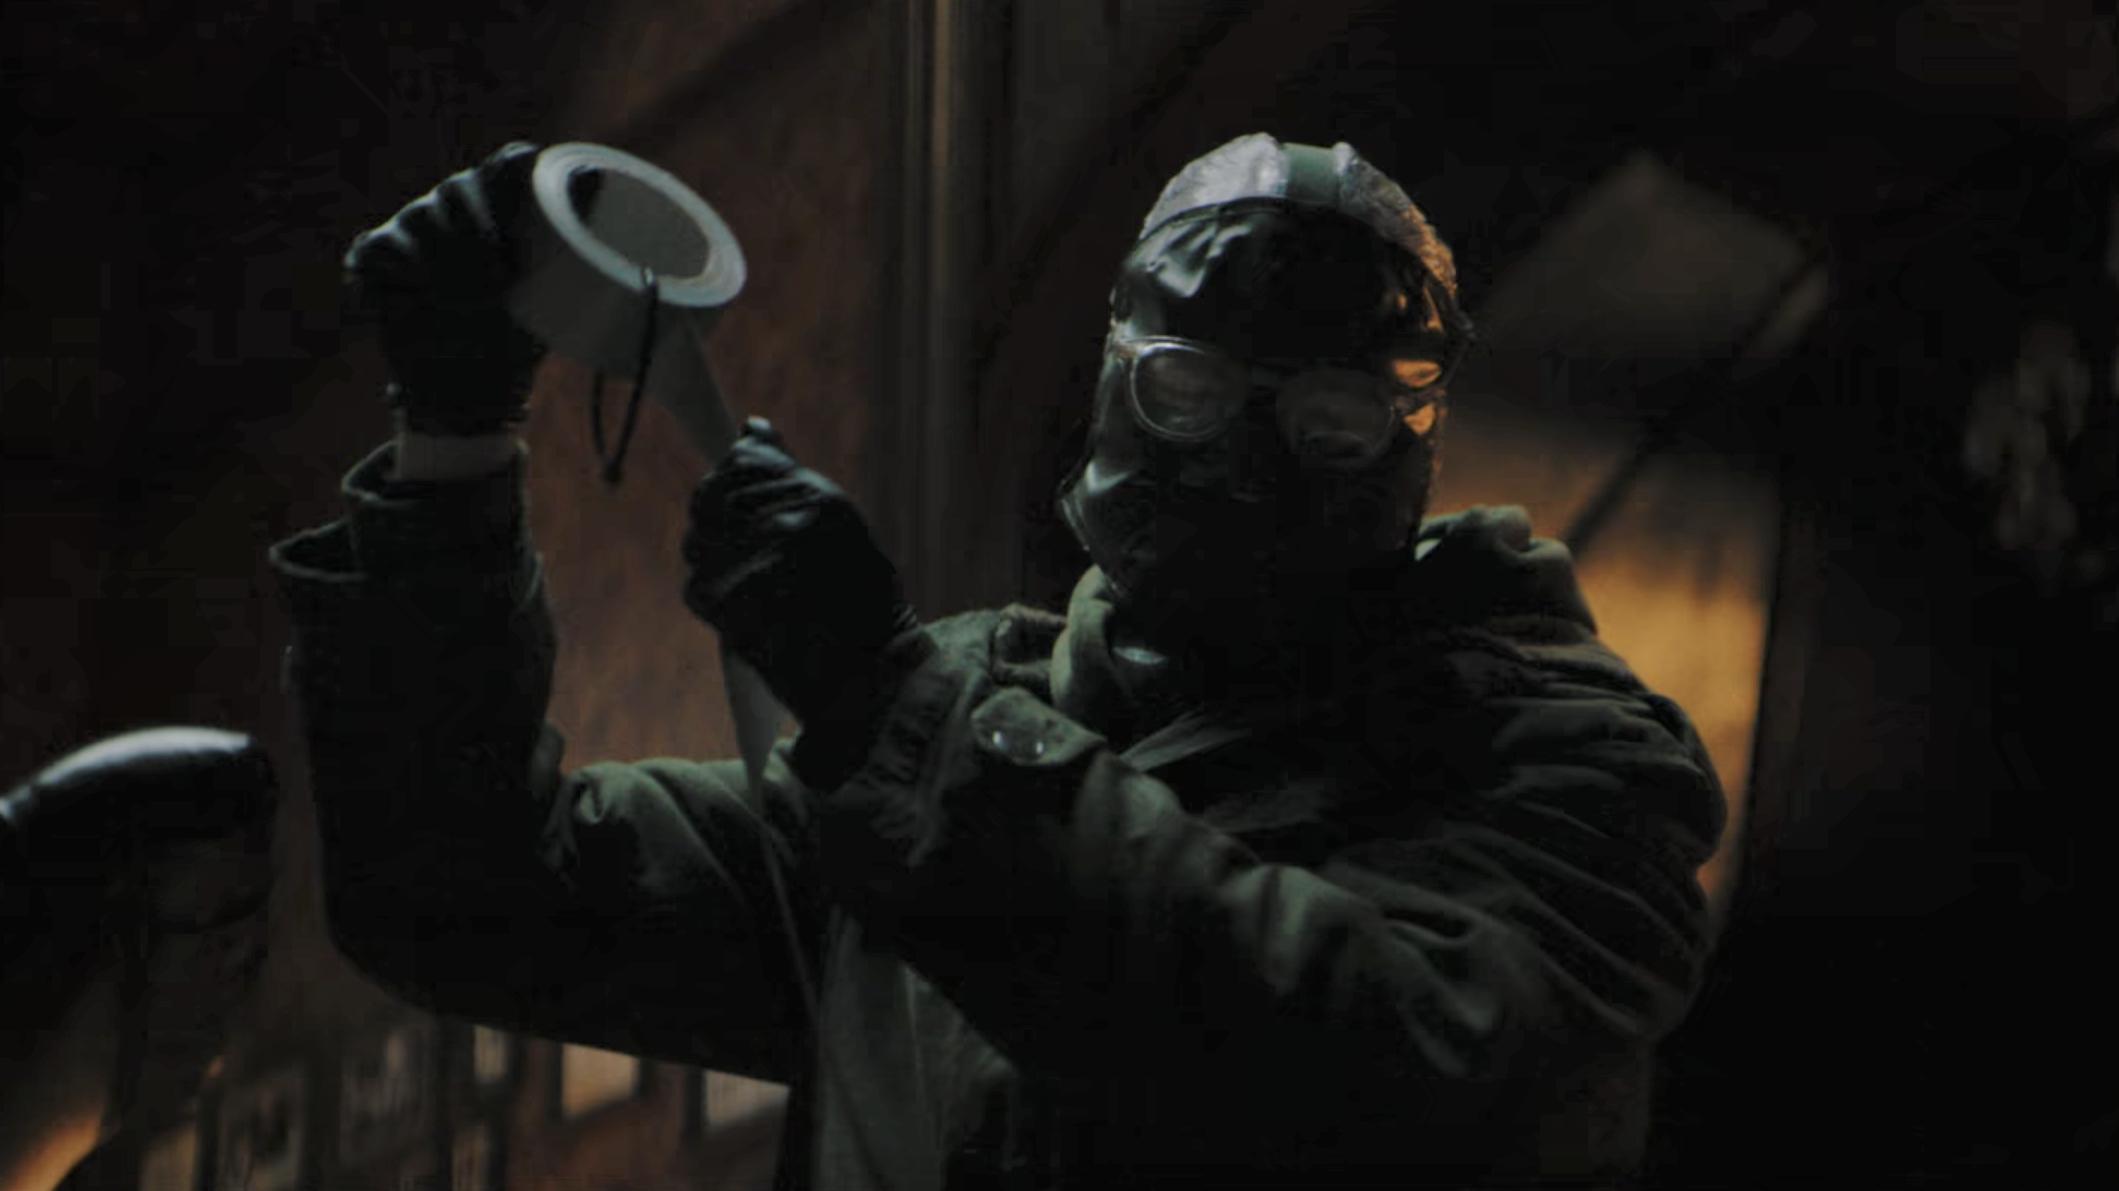 The Riddler - The Batman Trailer (2021)